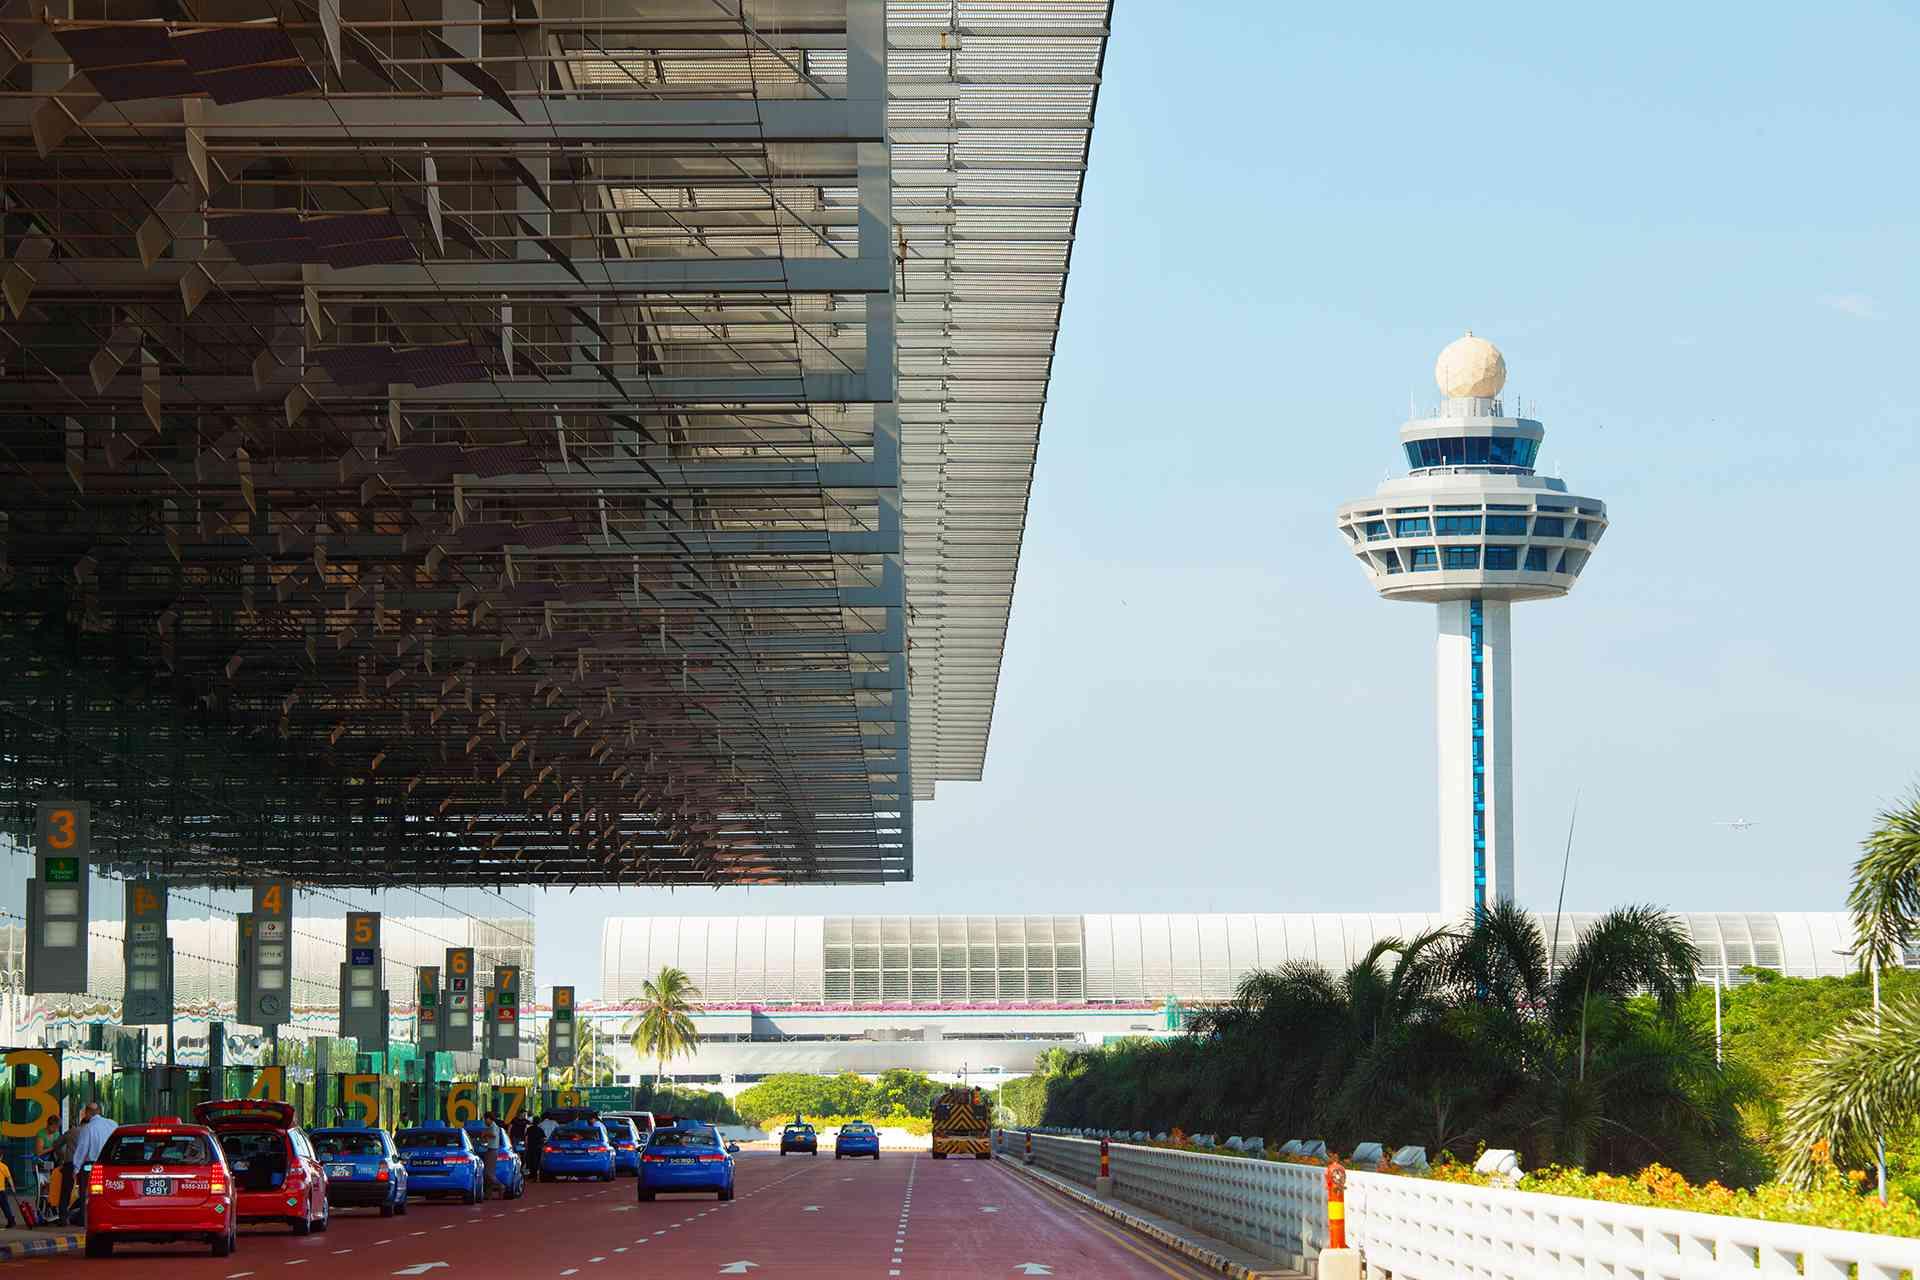 Singapore Changi Airport Control Tower